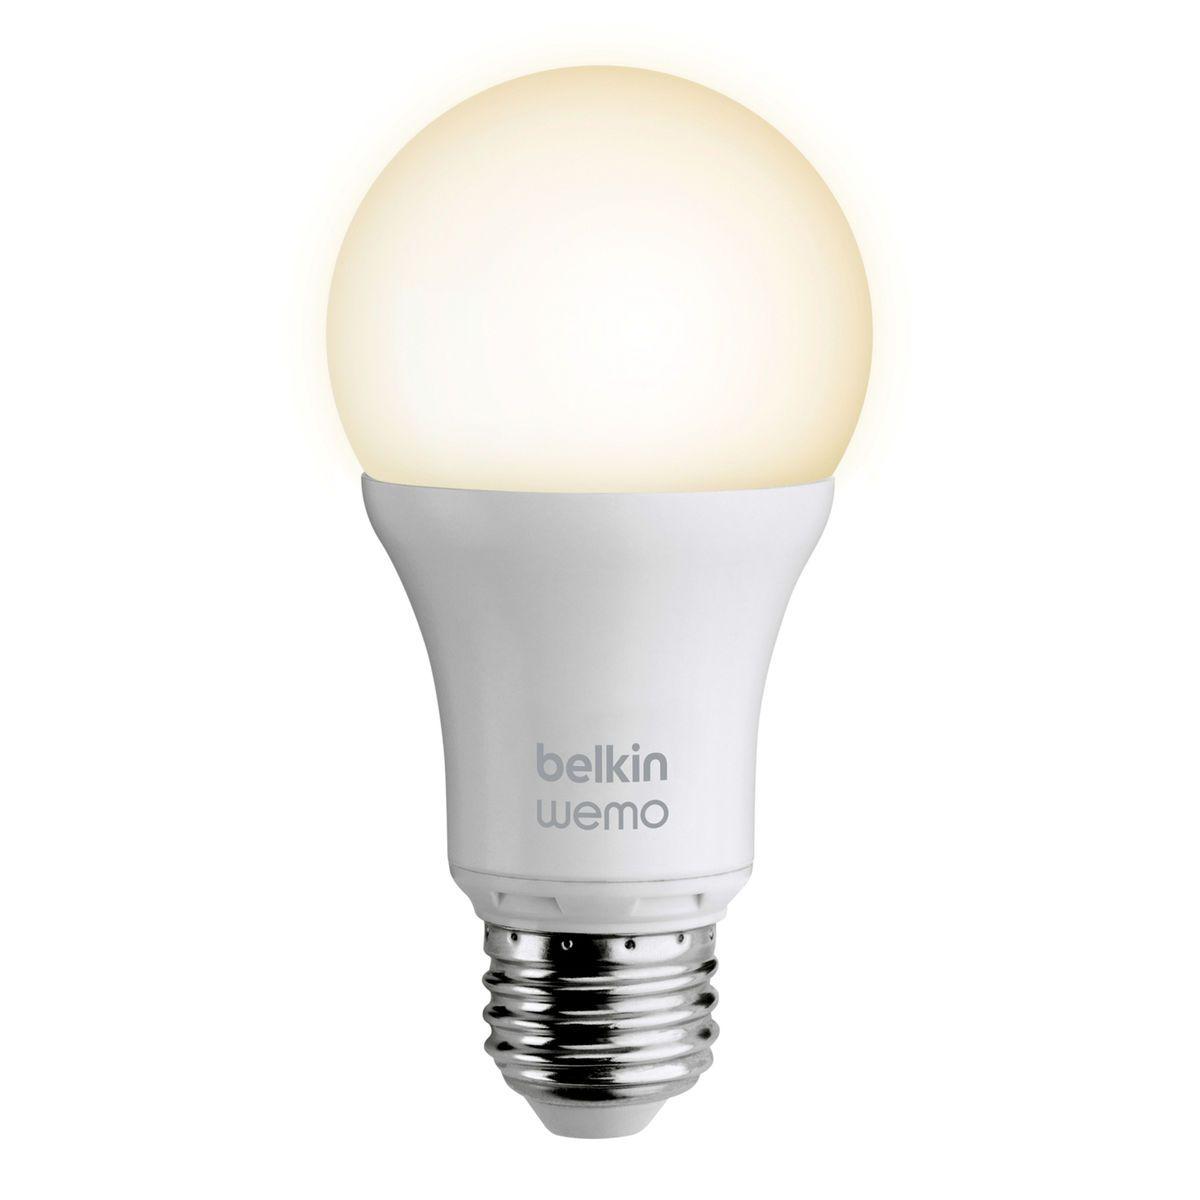 Belkin WeMo® 9.5W E27 Smart WiFi & 3G Controlled Λάμπα LED